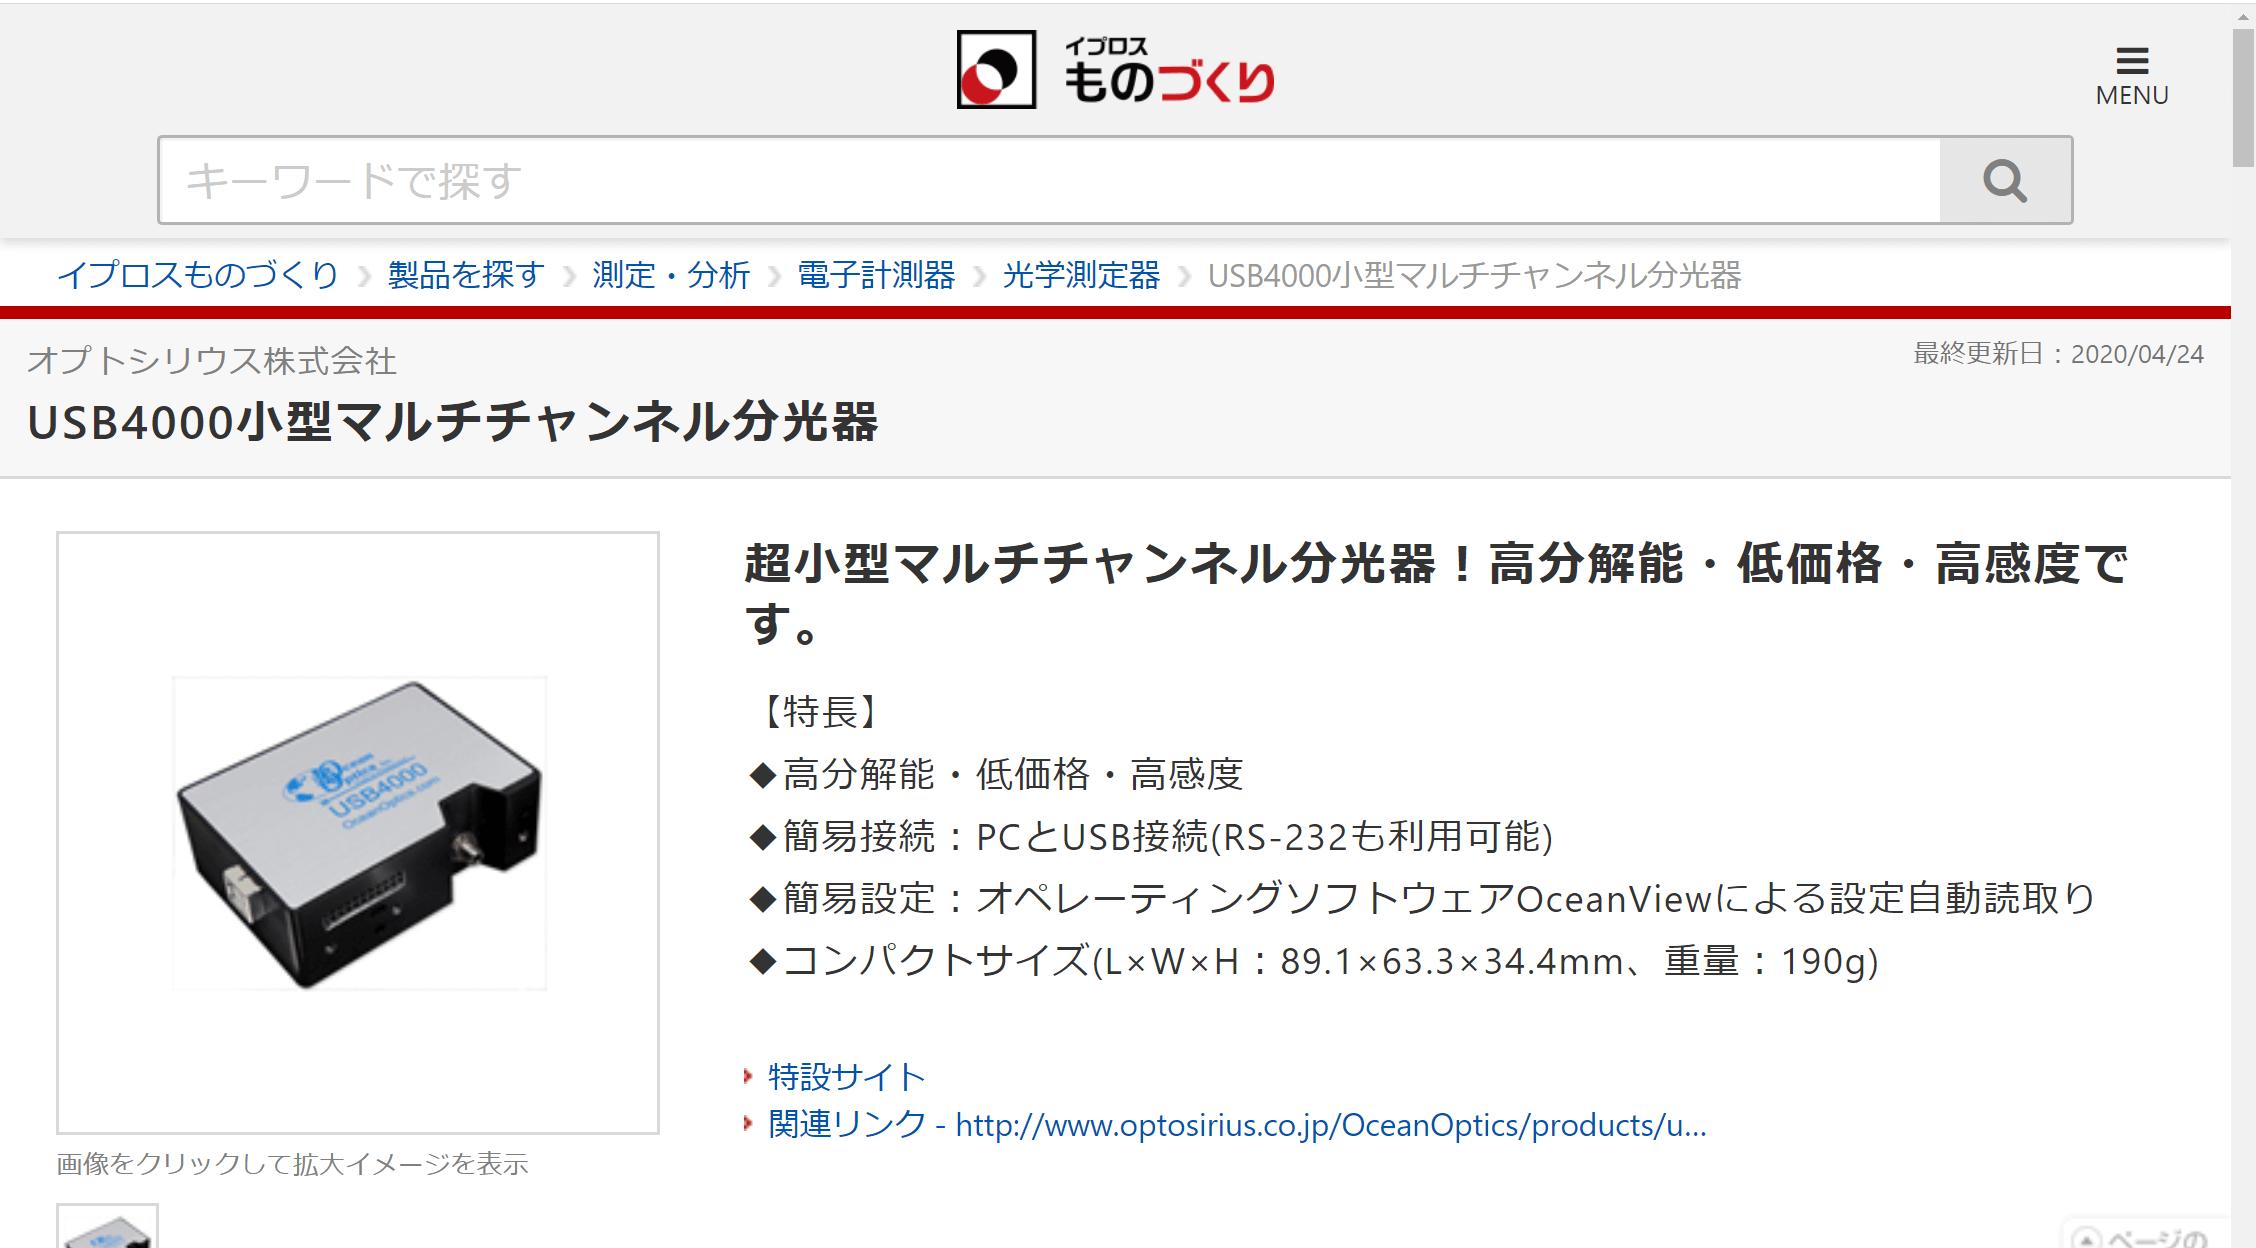 USB4000小型マルチチャンネル分光器